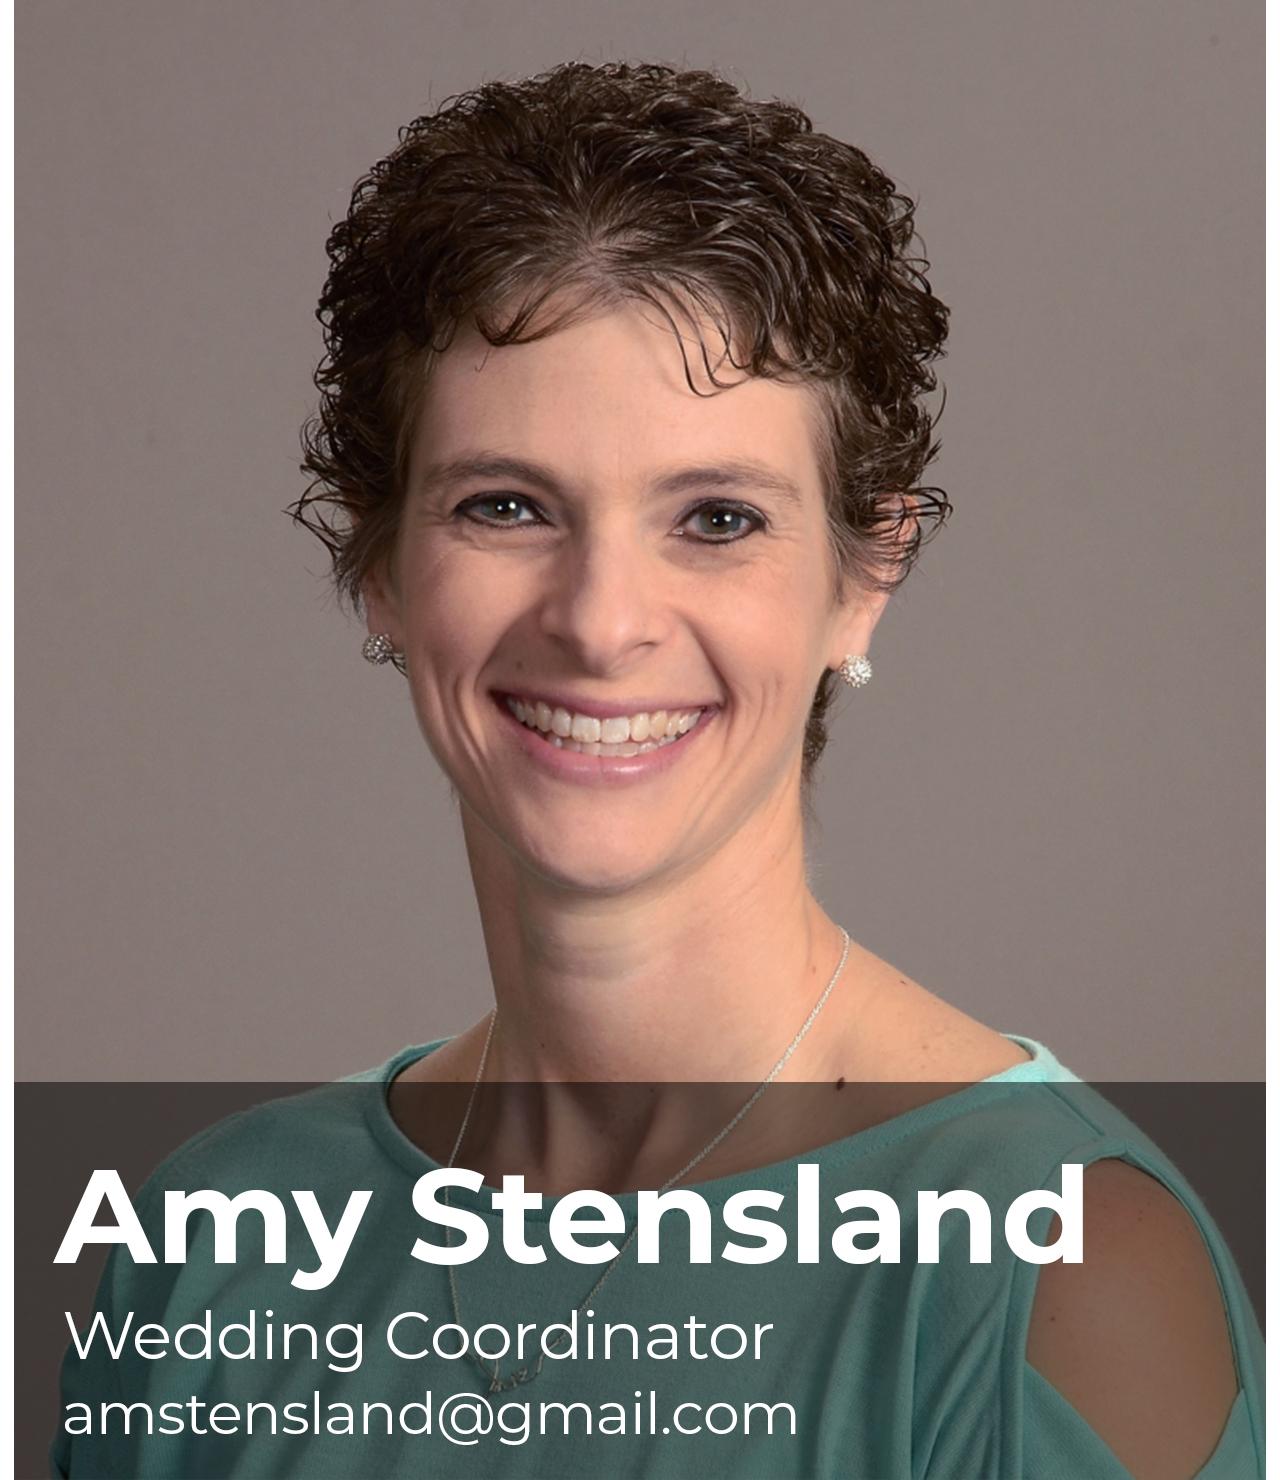 Amy Stensland